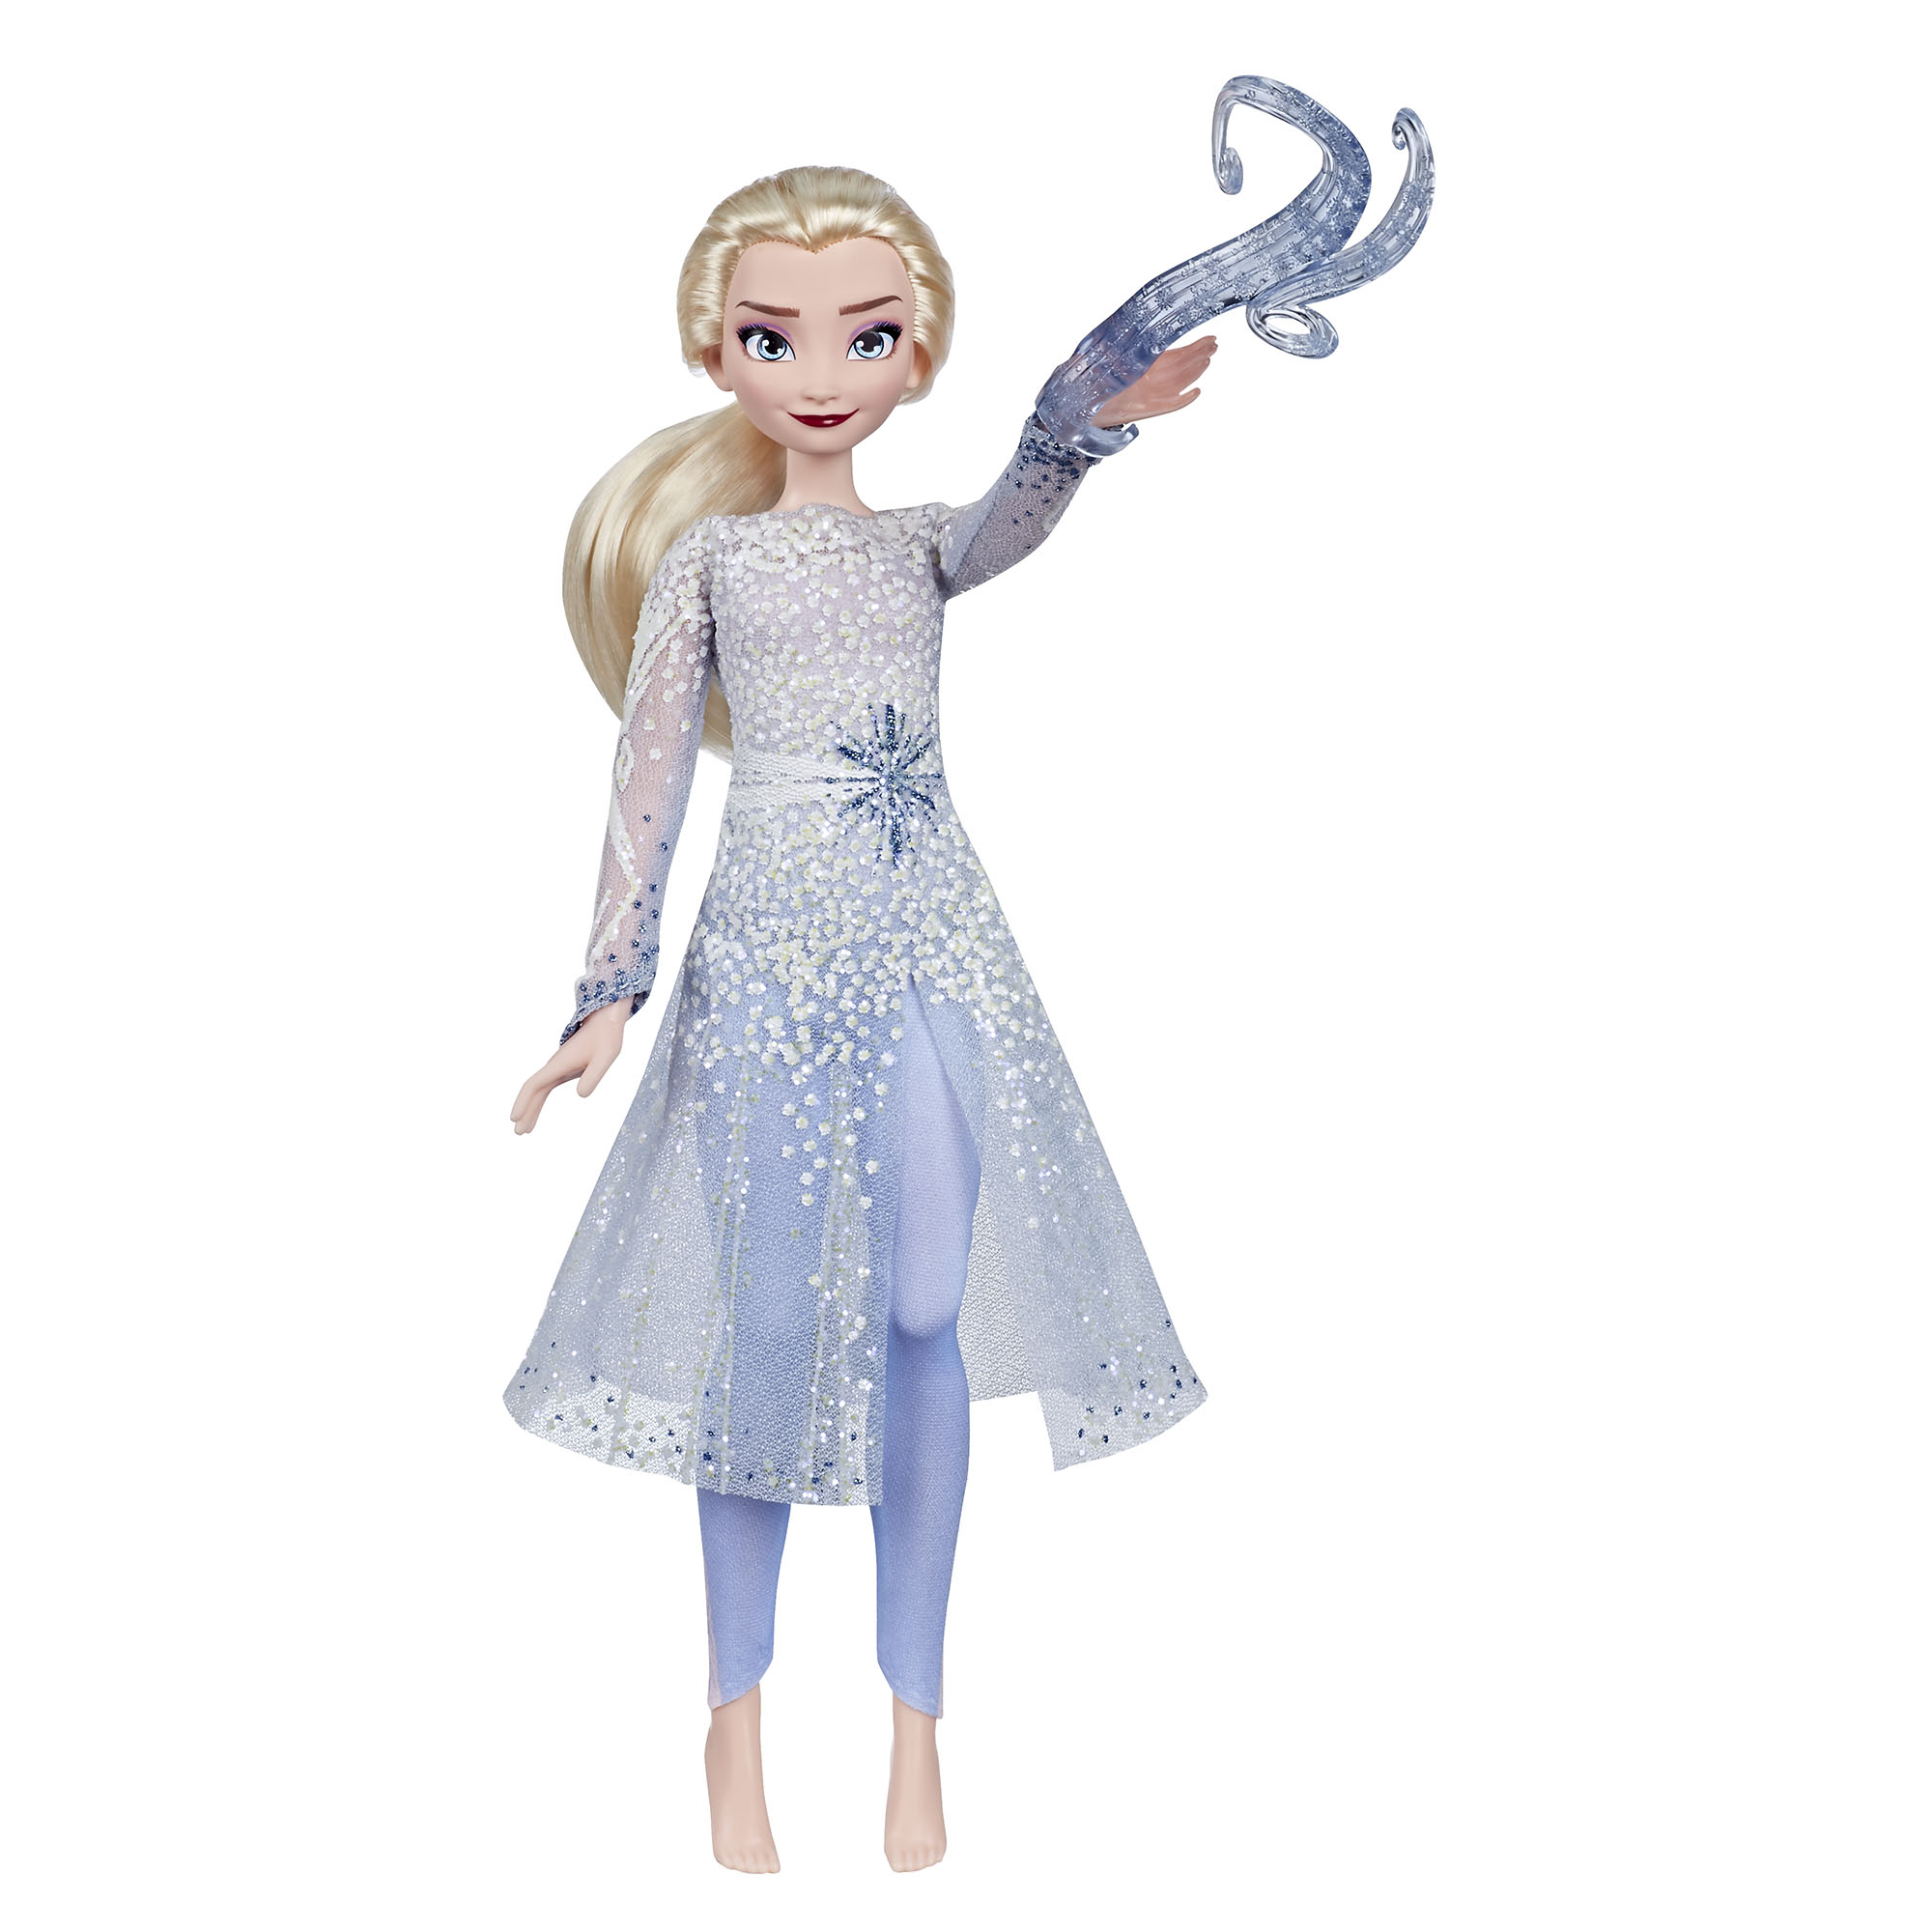 E8569 FRZ Magical Discovery Elsa Doll OOP